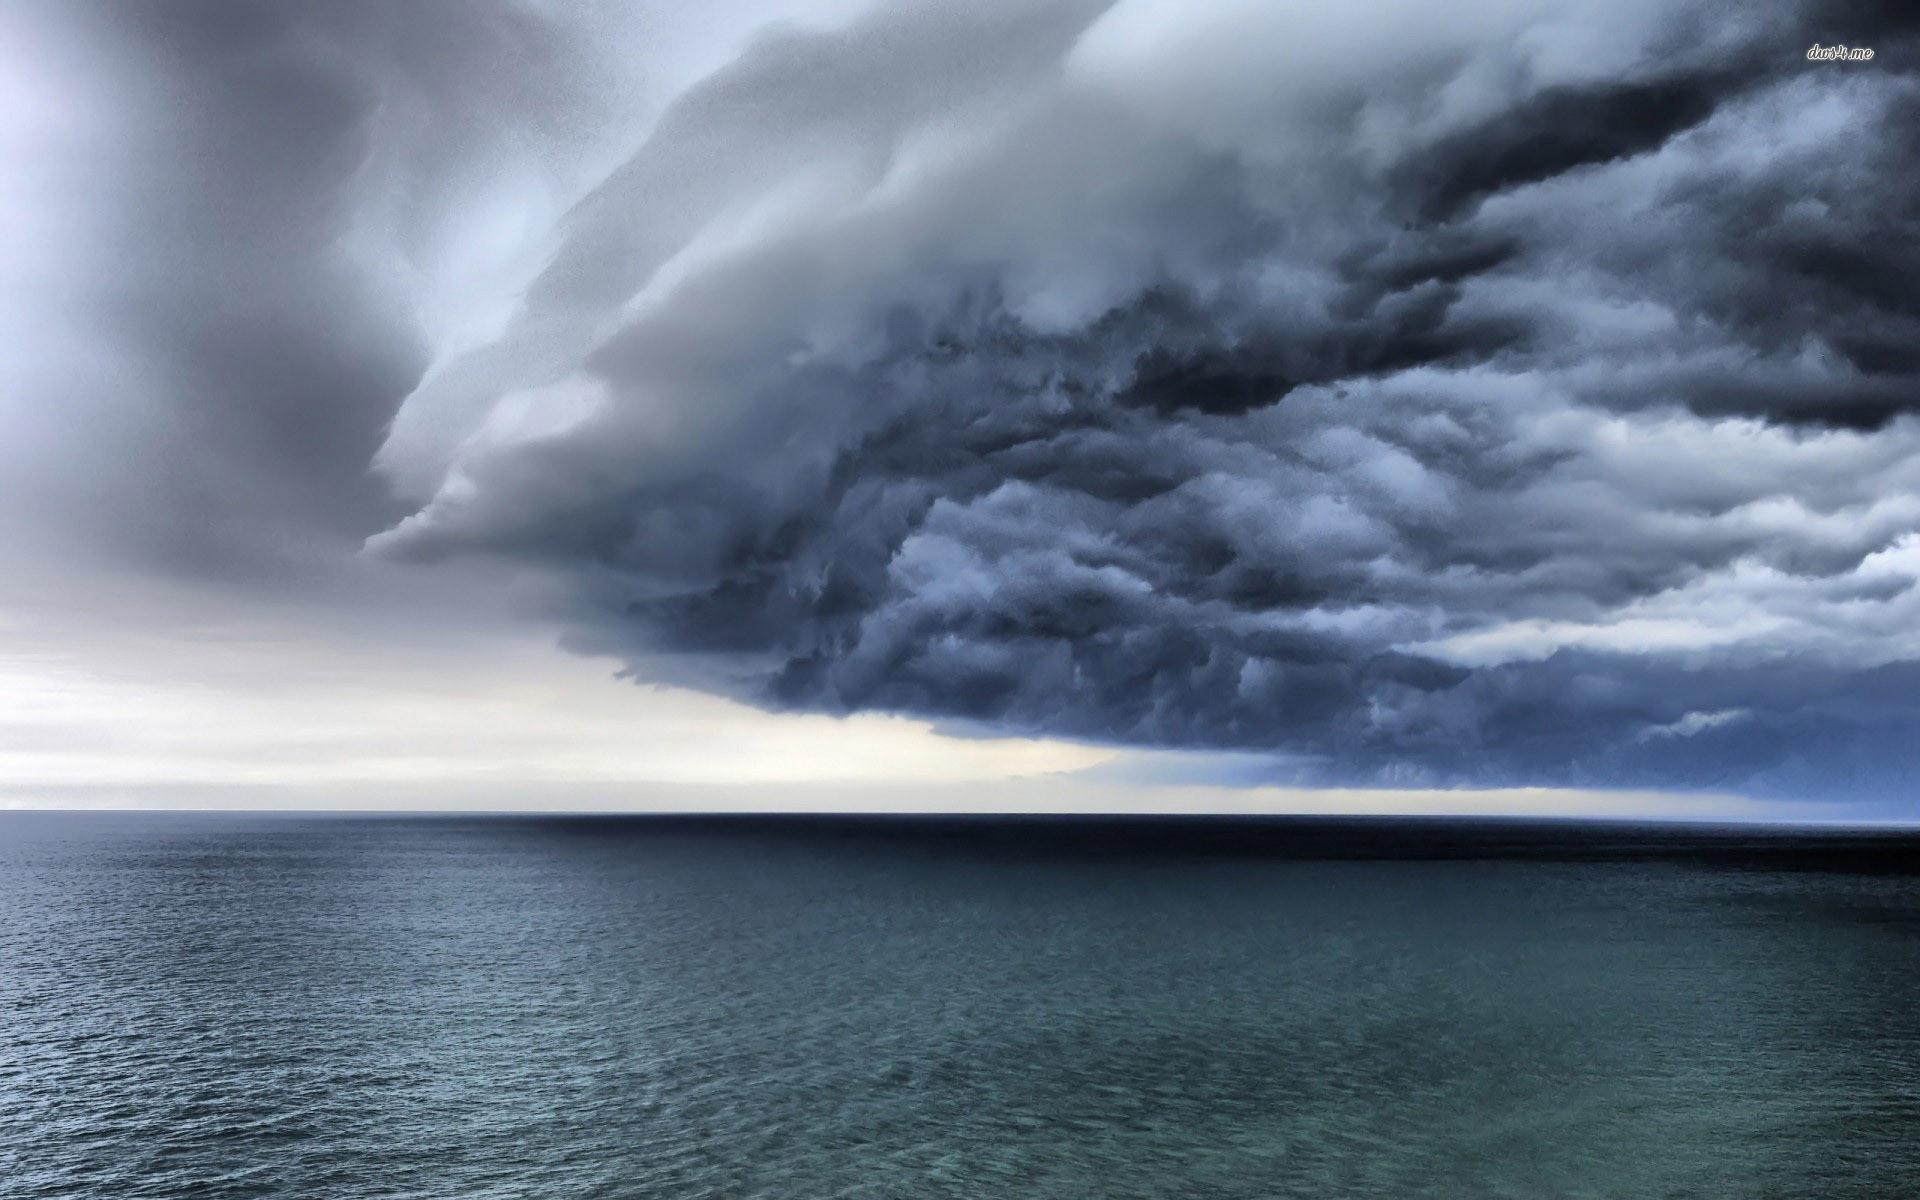 Storm clouds over the ocean Beach HD desktop wallpaper, Sky wallpaper,  Cloud wallpaper, Ocean wallpaper, Storm wallpaper – Beaches no.